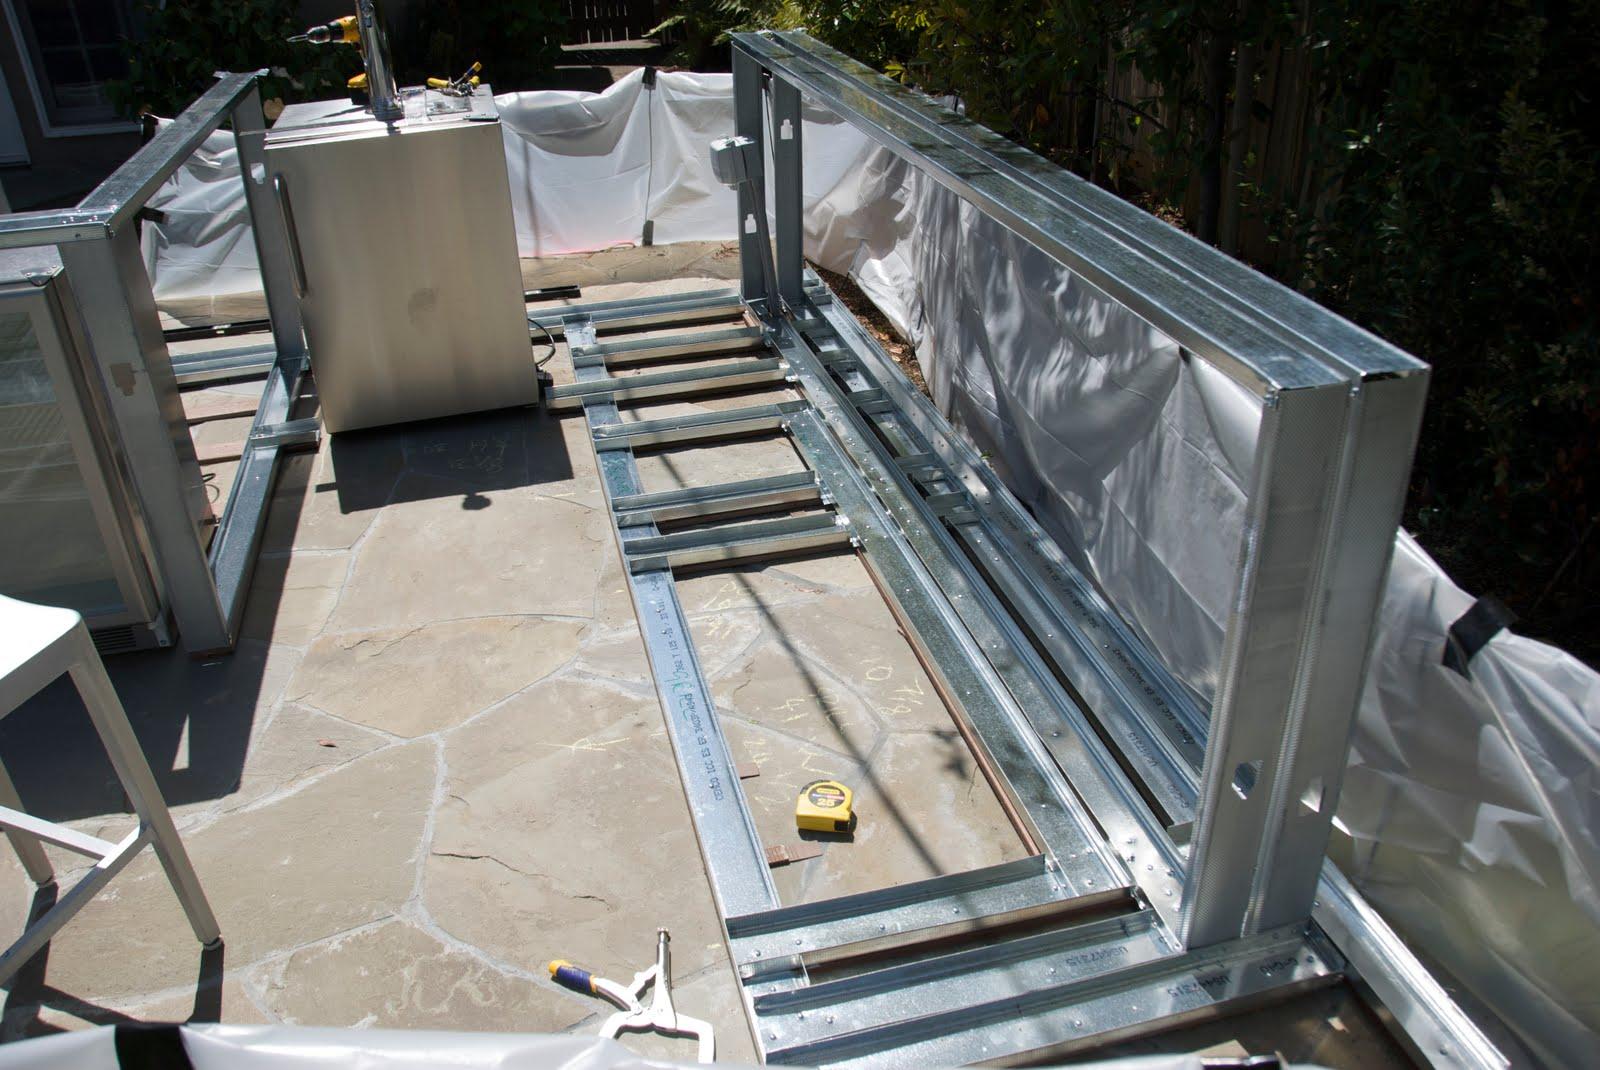 outdoor kitchen construction april 2010. Black Bedroom Furniture Sets. Home Design Ideas